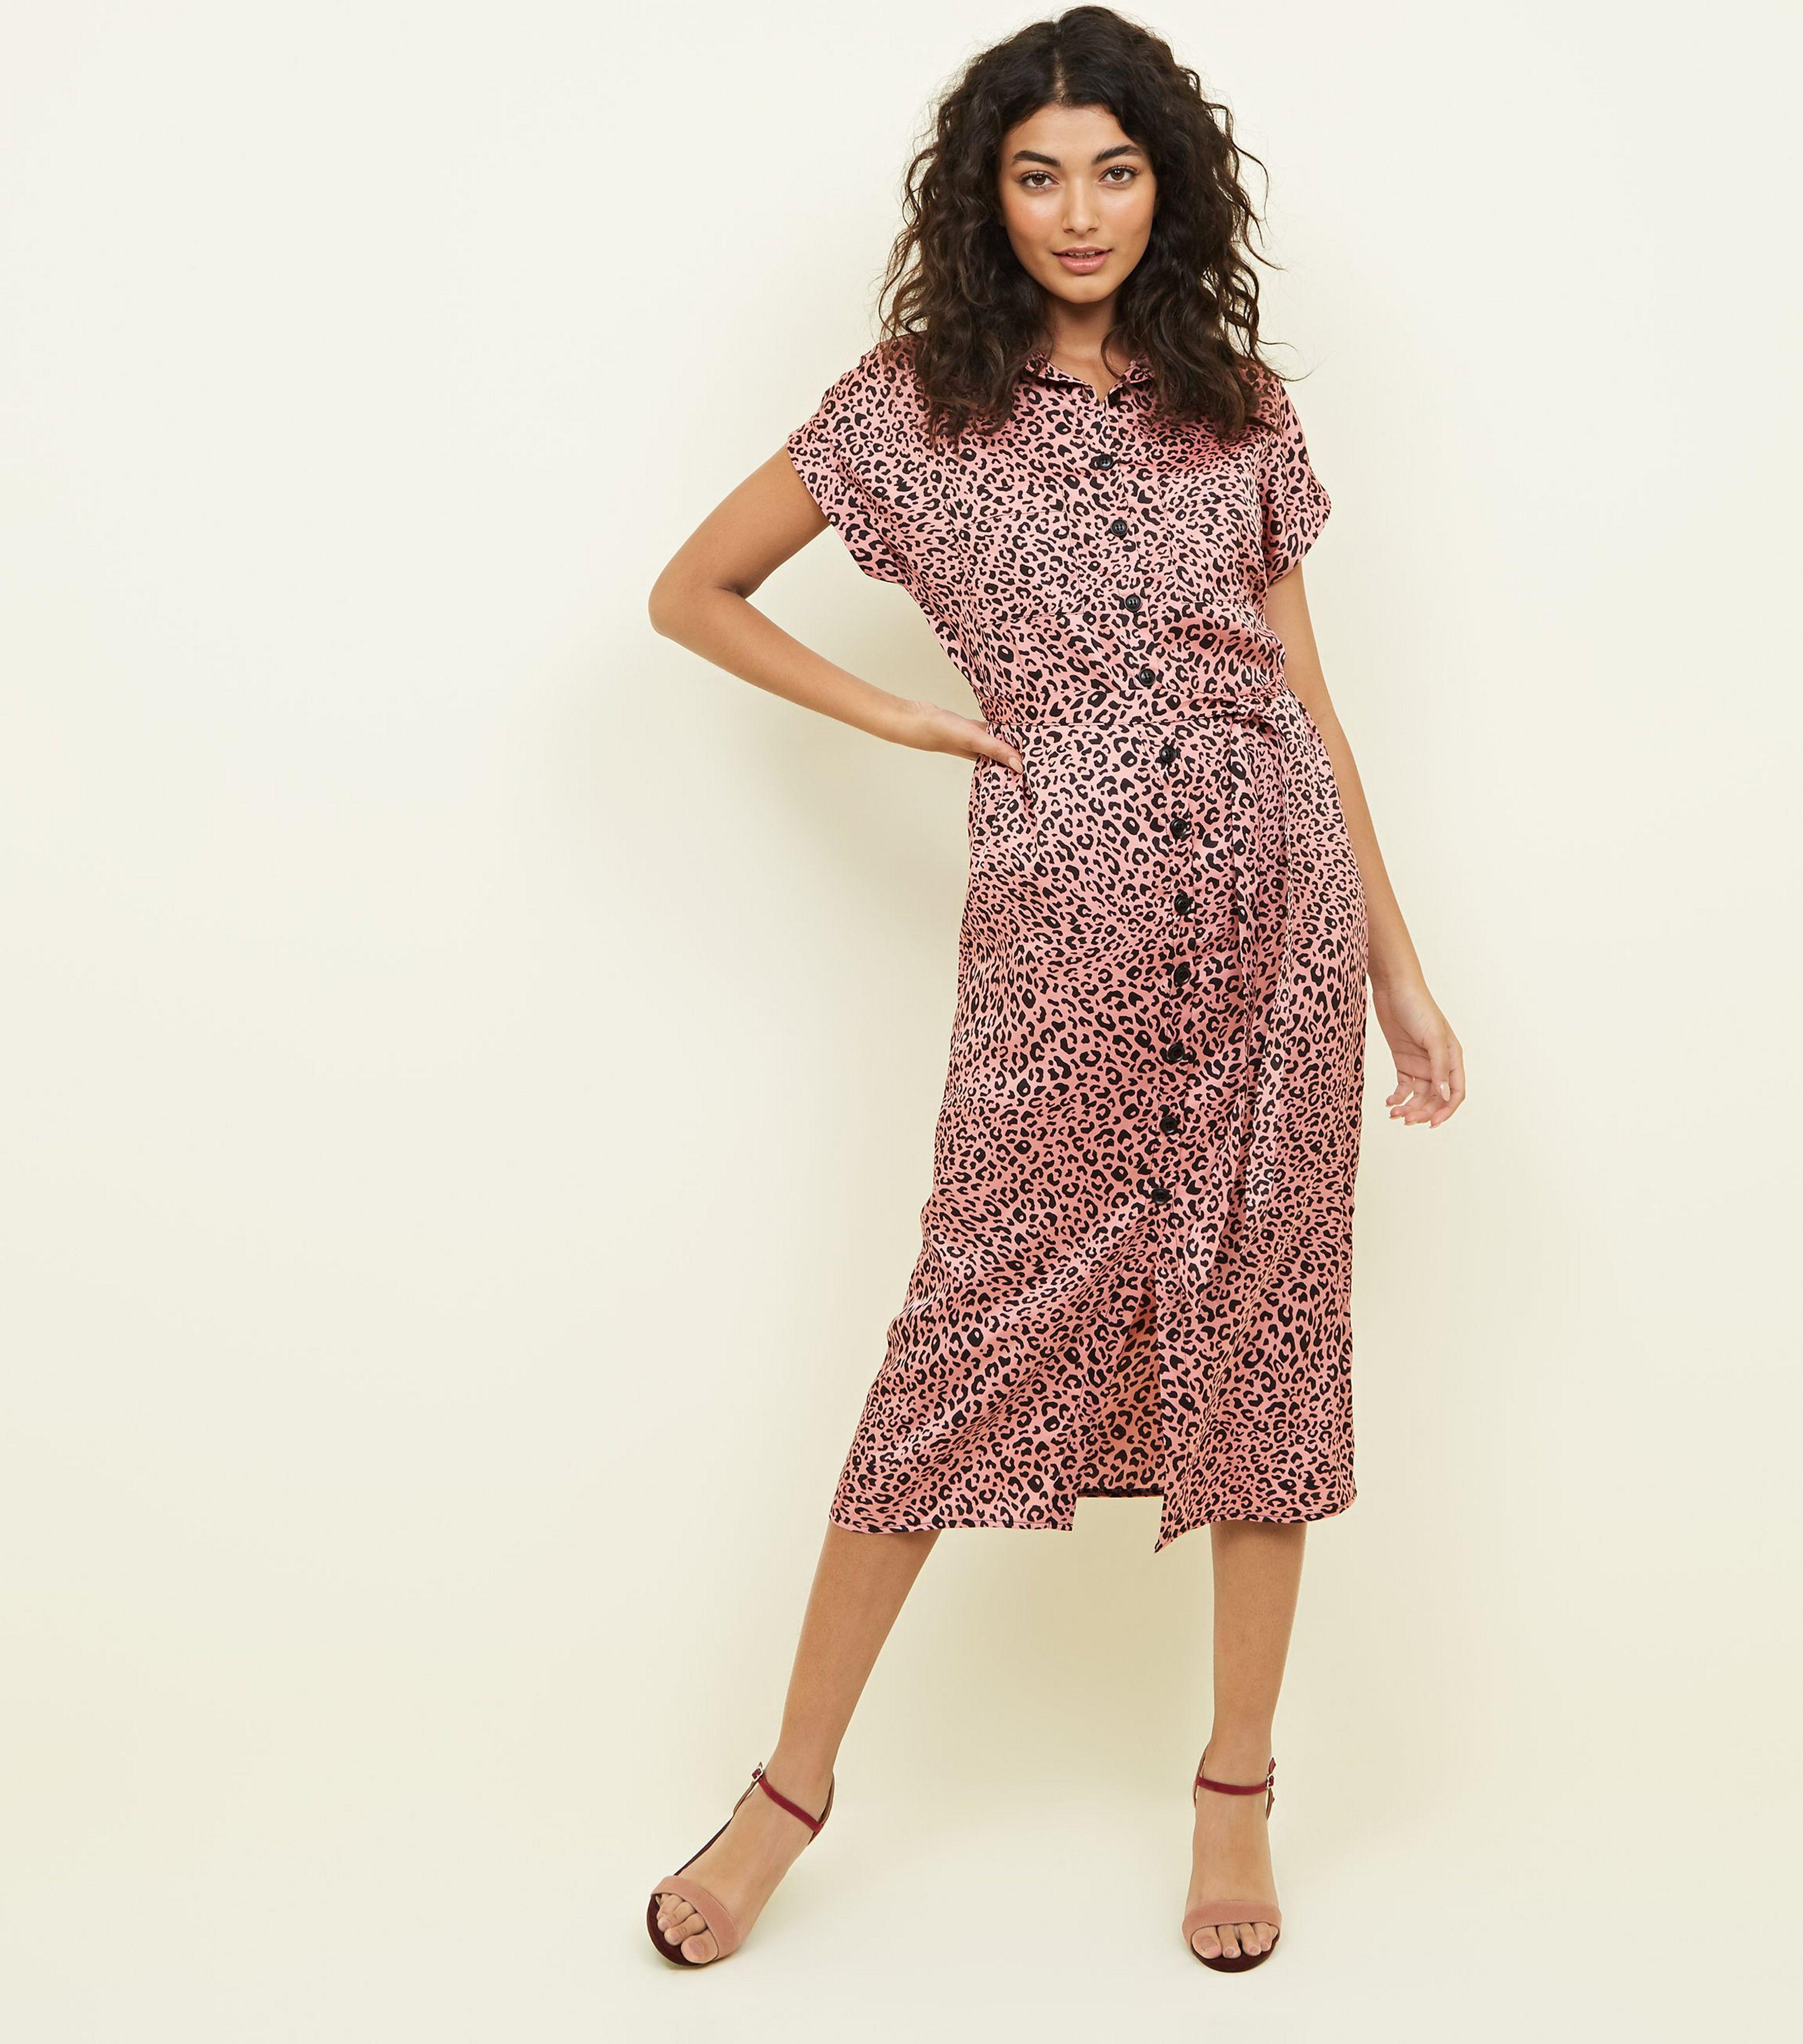 7af5deffd96c New Look Pink Leopard Print Satin Midi Shirt Dress in Pink - Lyst